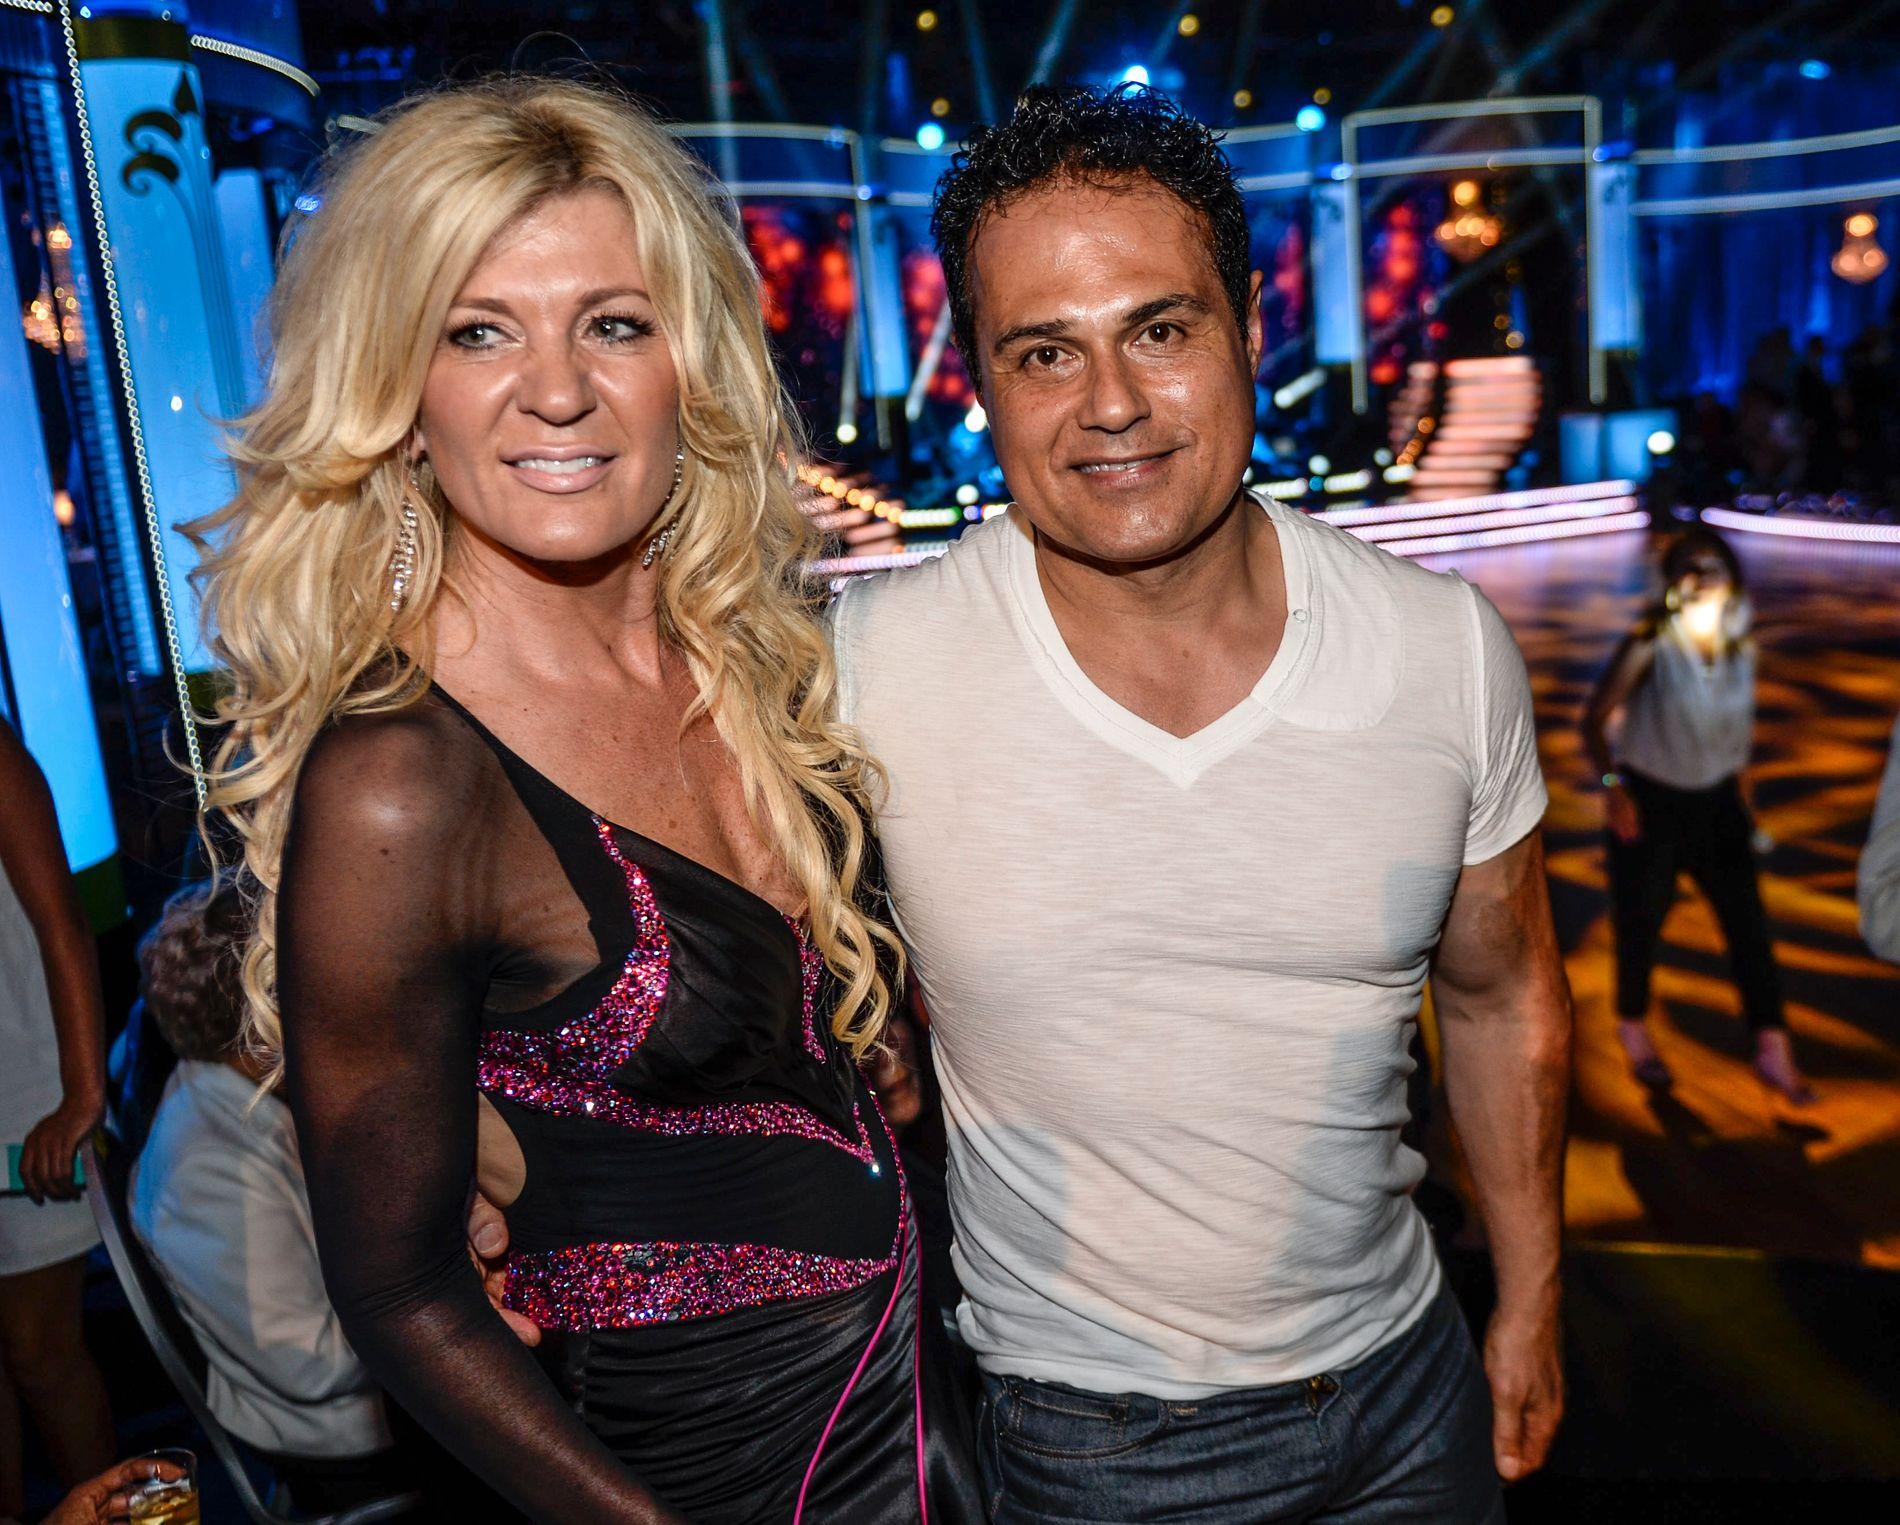 DANS: Maria og Kamran Montazami da hun var med på svenske «Skal vi danse» TV4 i 2013.